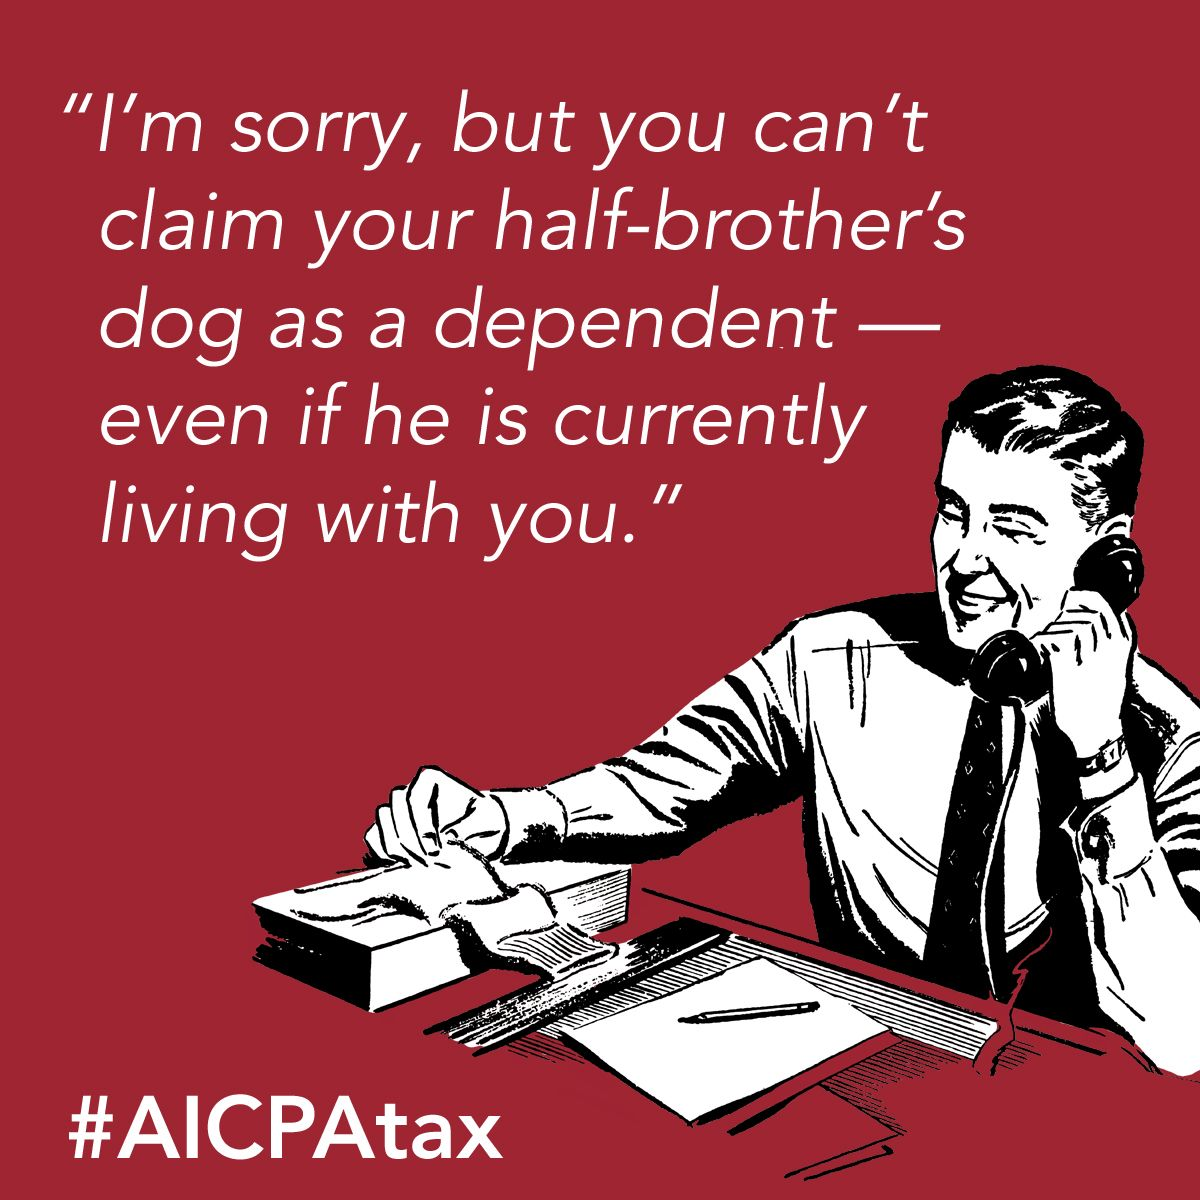 Tax Season Is Here Accounting Humor Accounting Humor Tax Season Humor Income Tax Humor